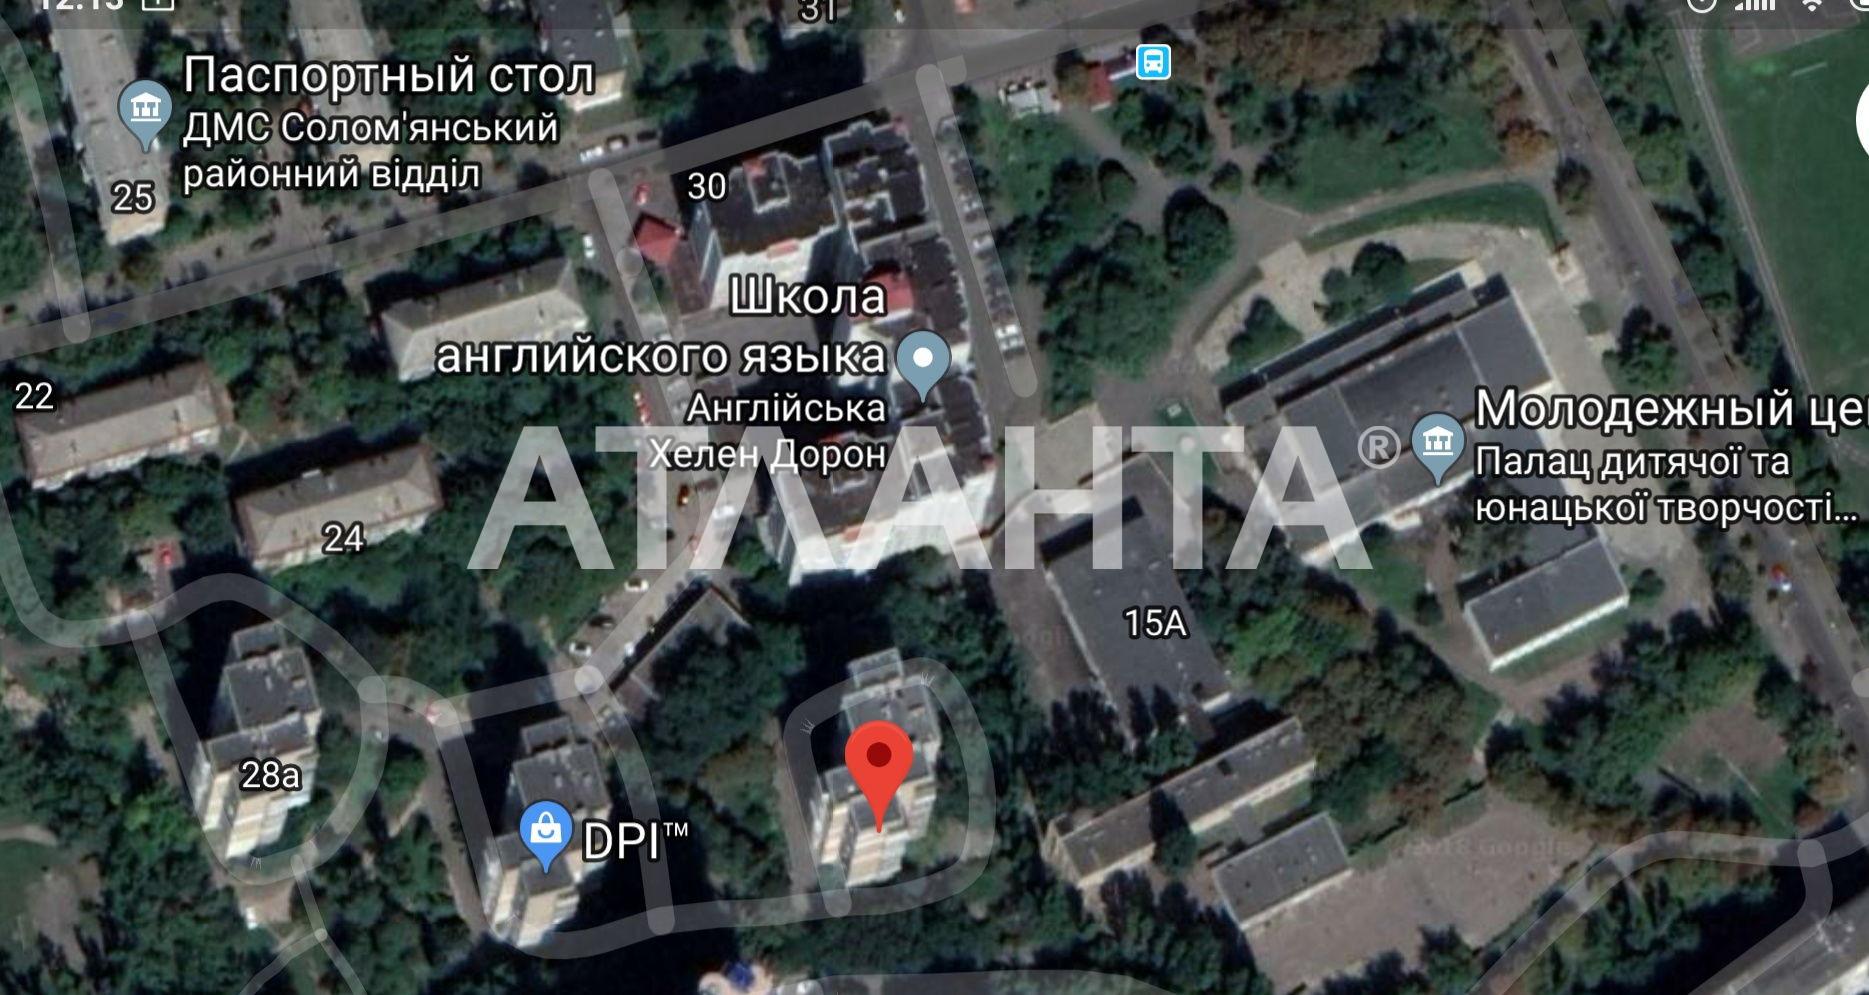 Продается 1-комнатная Квартира на ул. Ереванская — 40 000 у.е. (фото №5)